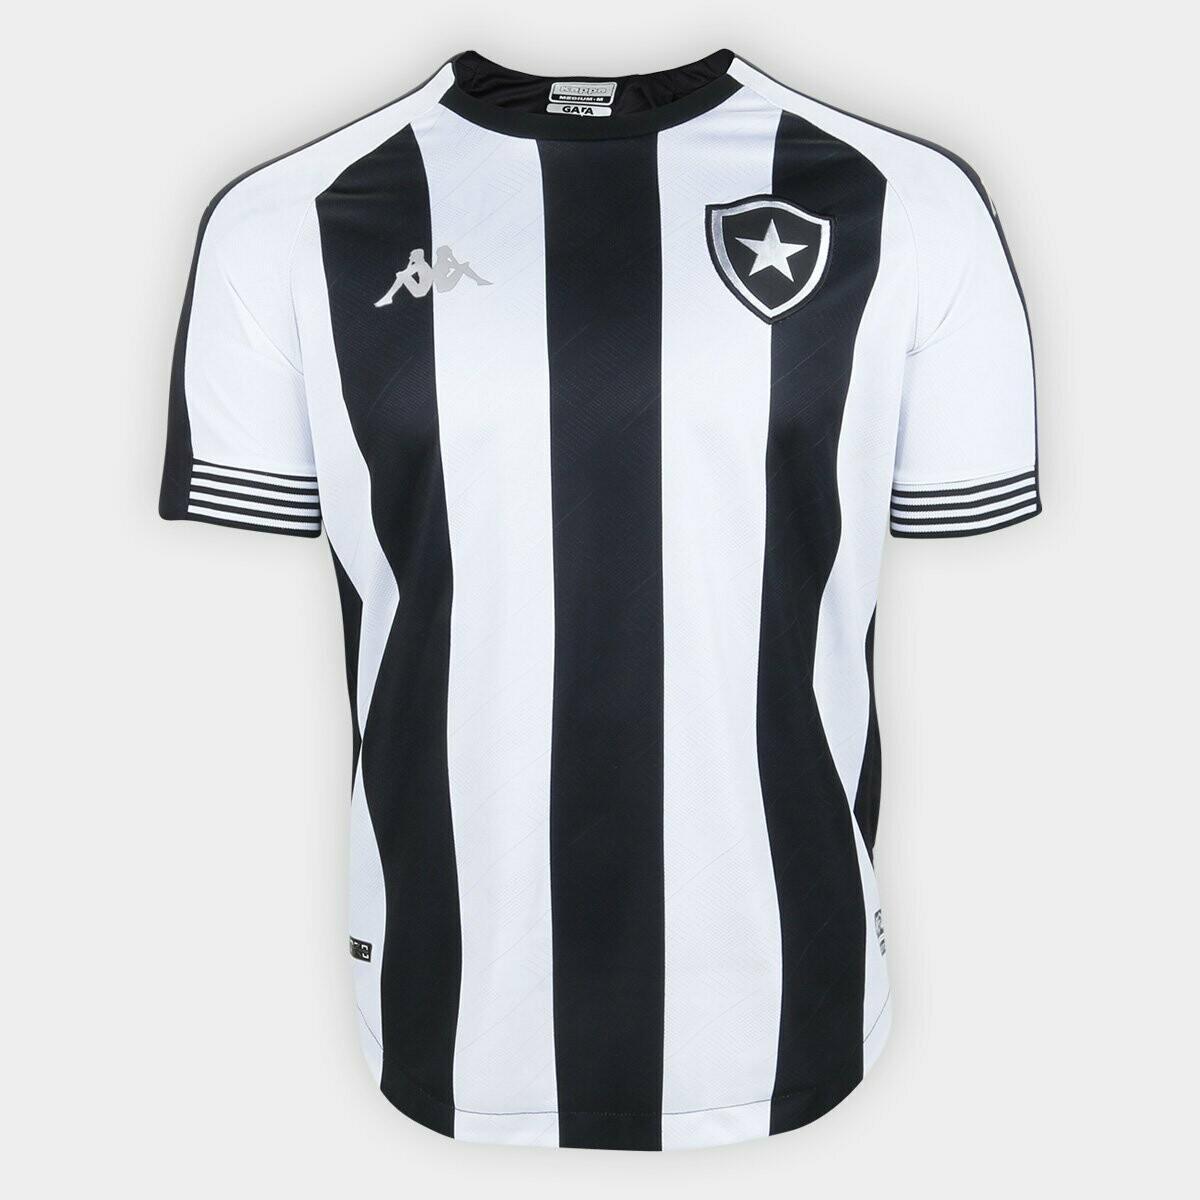 Camisa Botafogo I 20/21 Torcedor Kappa Masculina - Preto e Branco